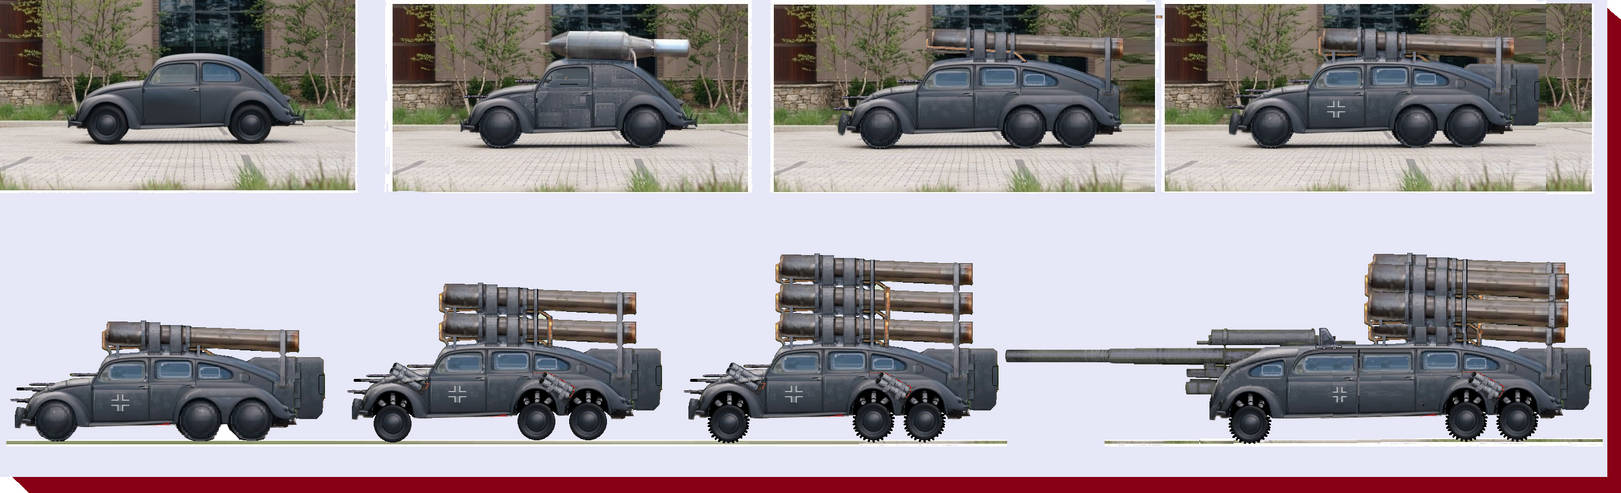 Veeb Volks Vagon Vengence Veapon